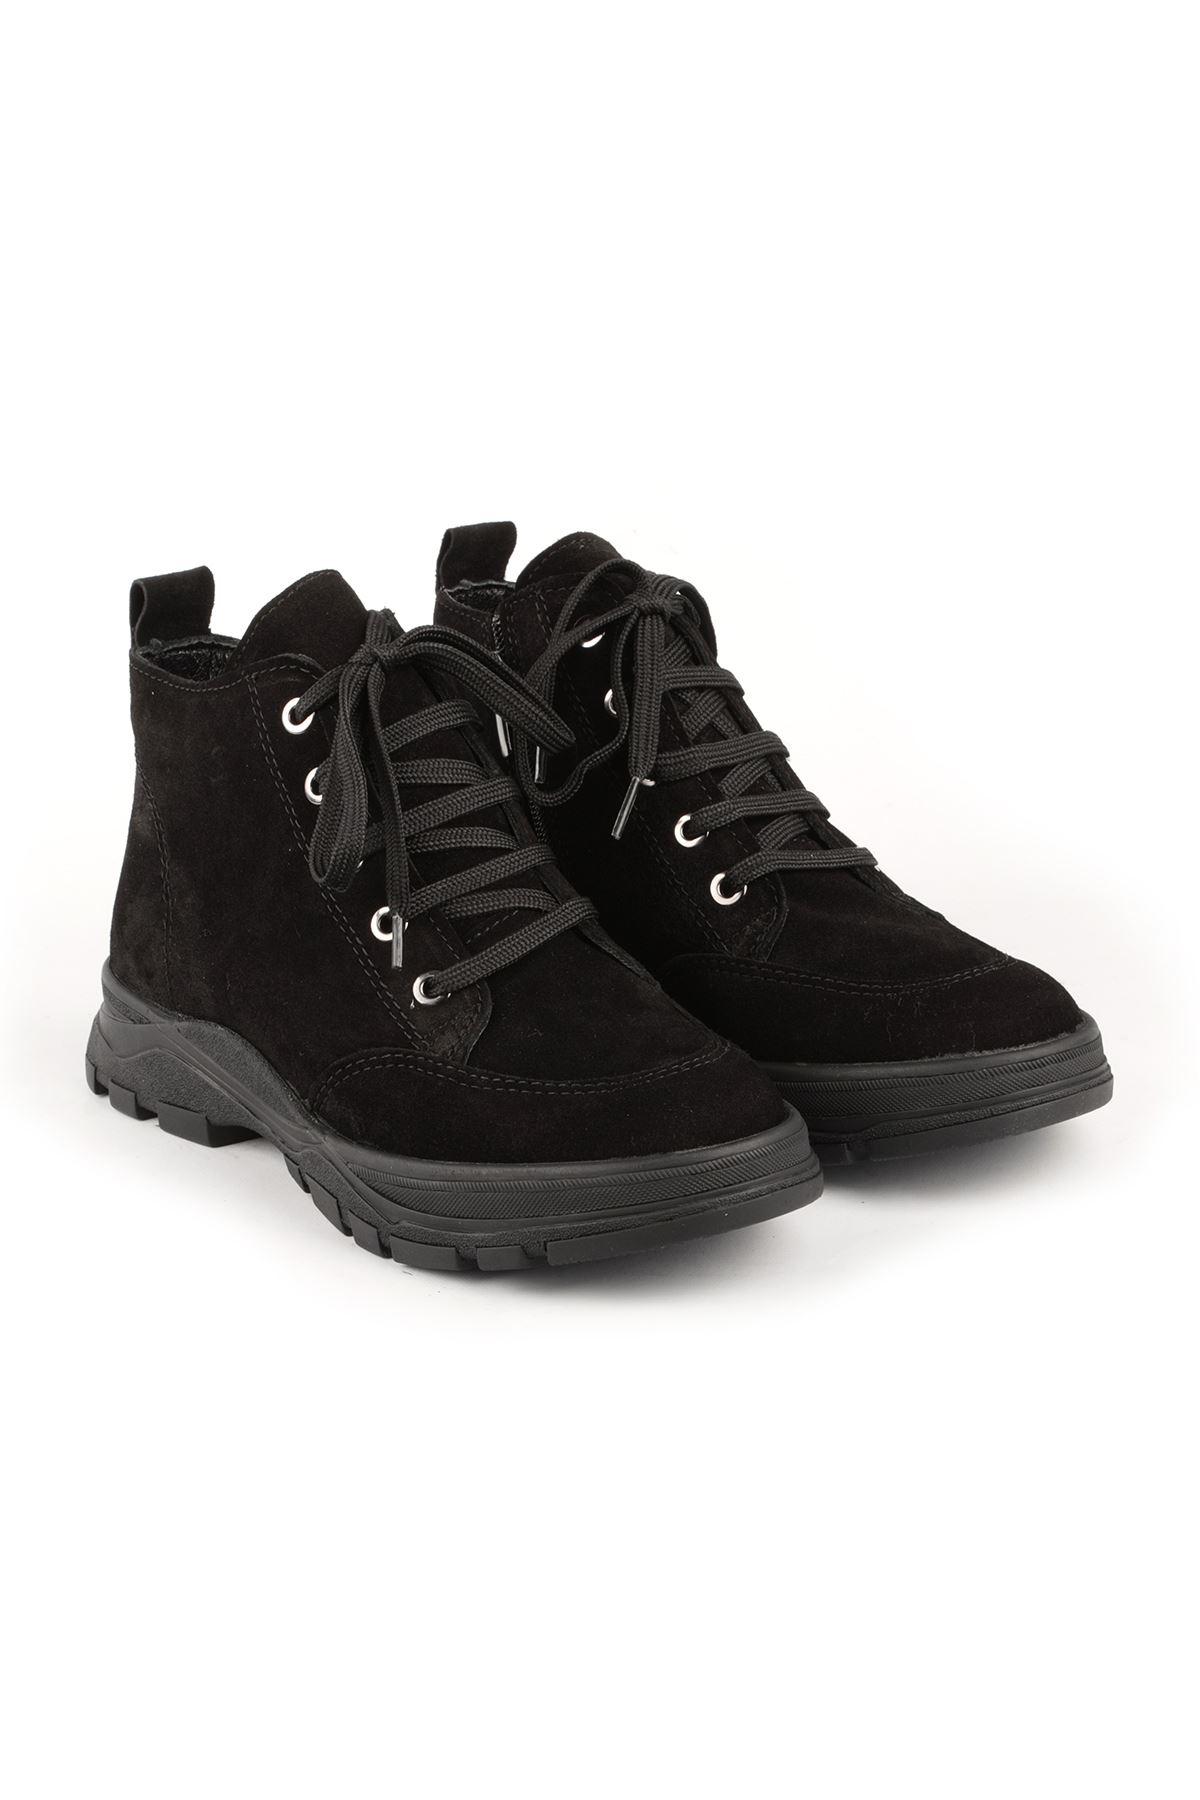 Libero MR15806 Black Suede Boots